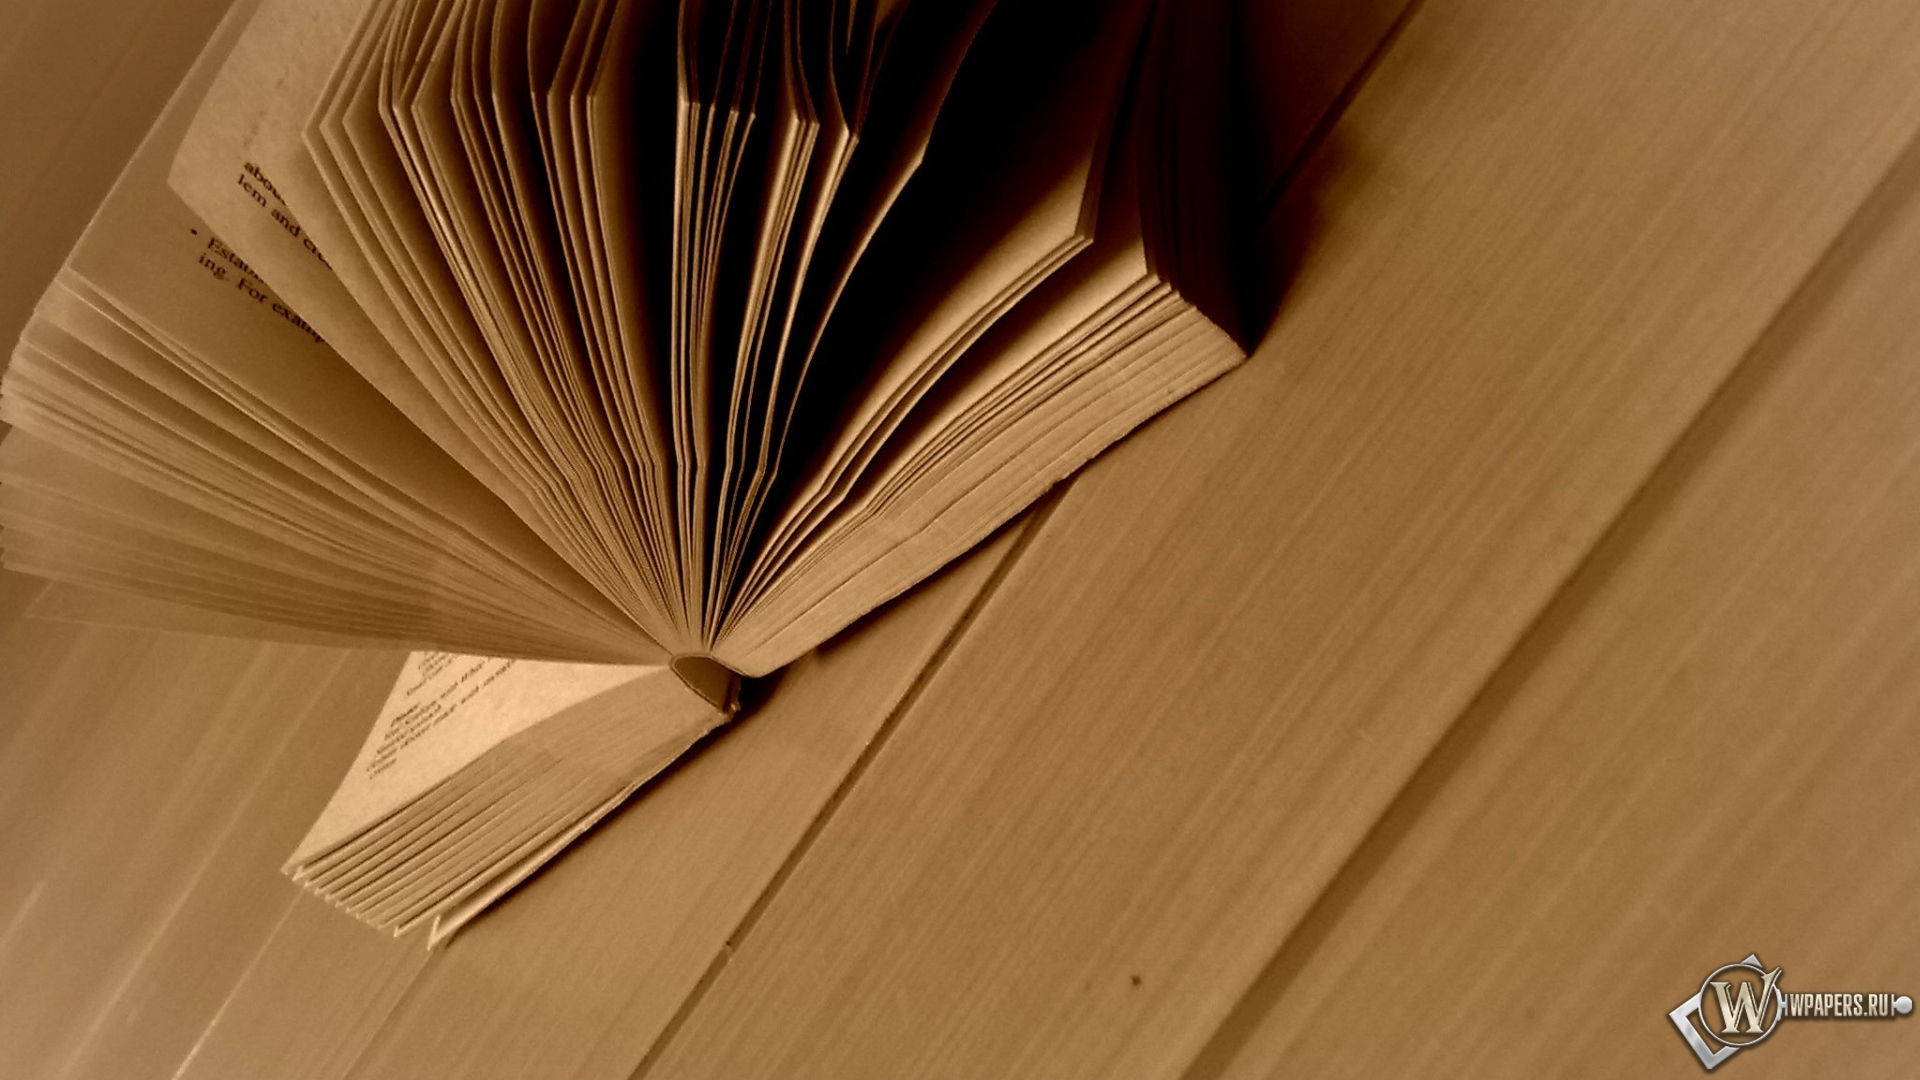 Развёрнутая книга 1920x1080